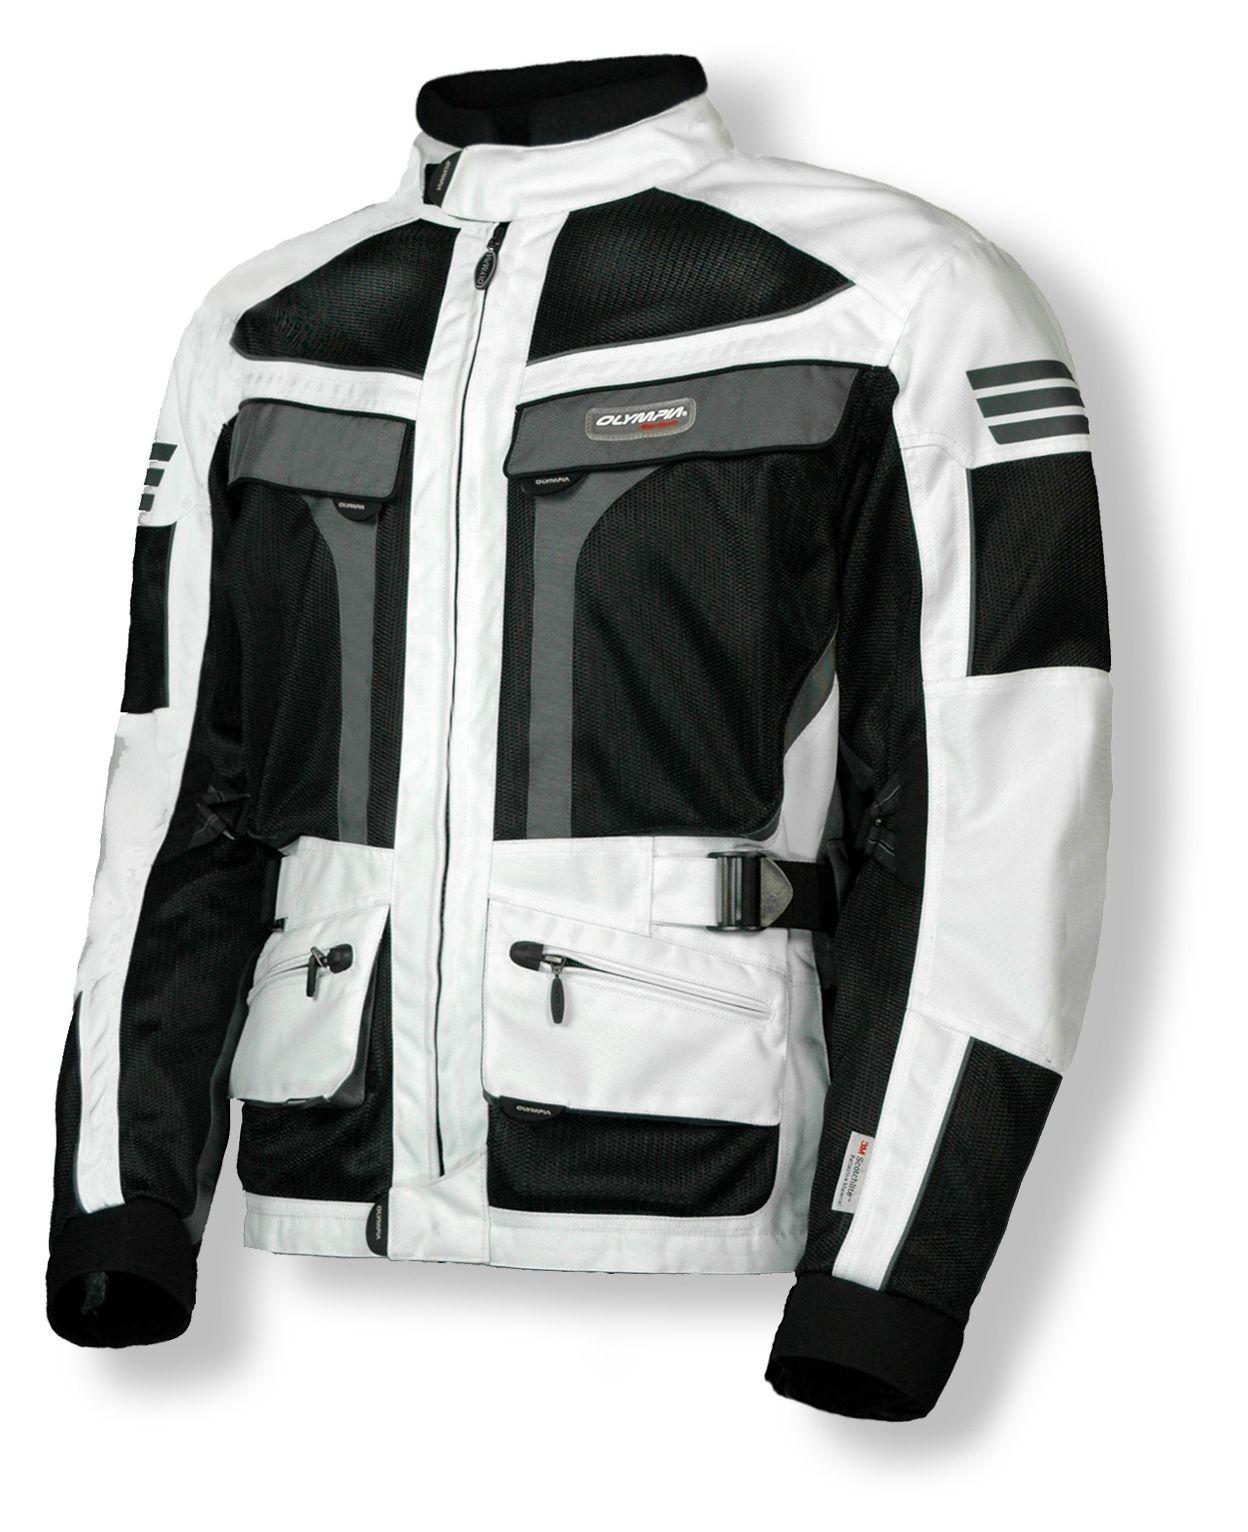 Olympia Motorcycle Jackets